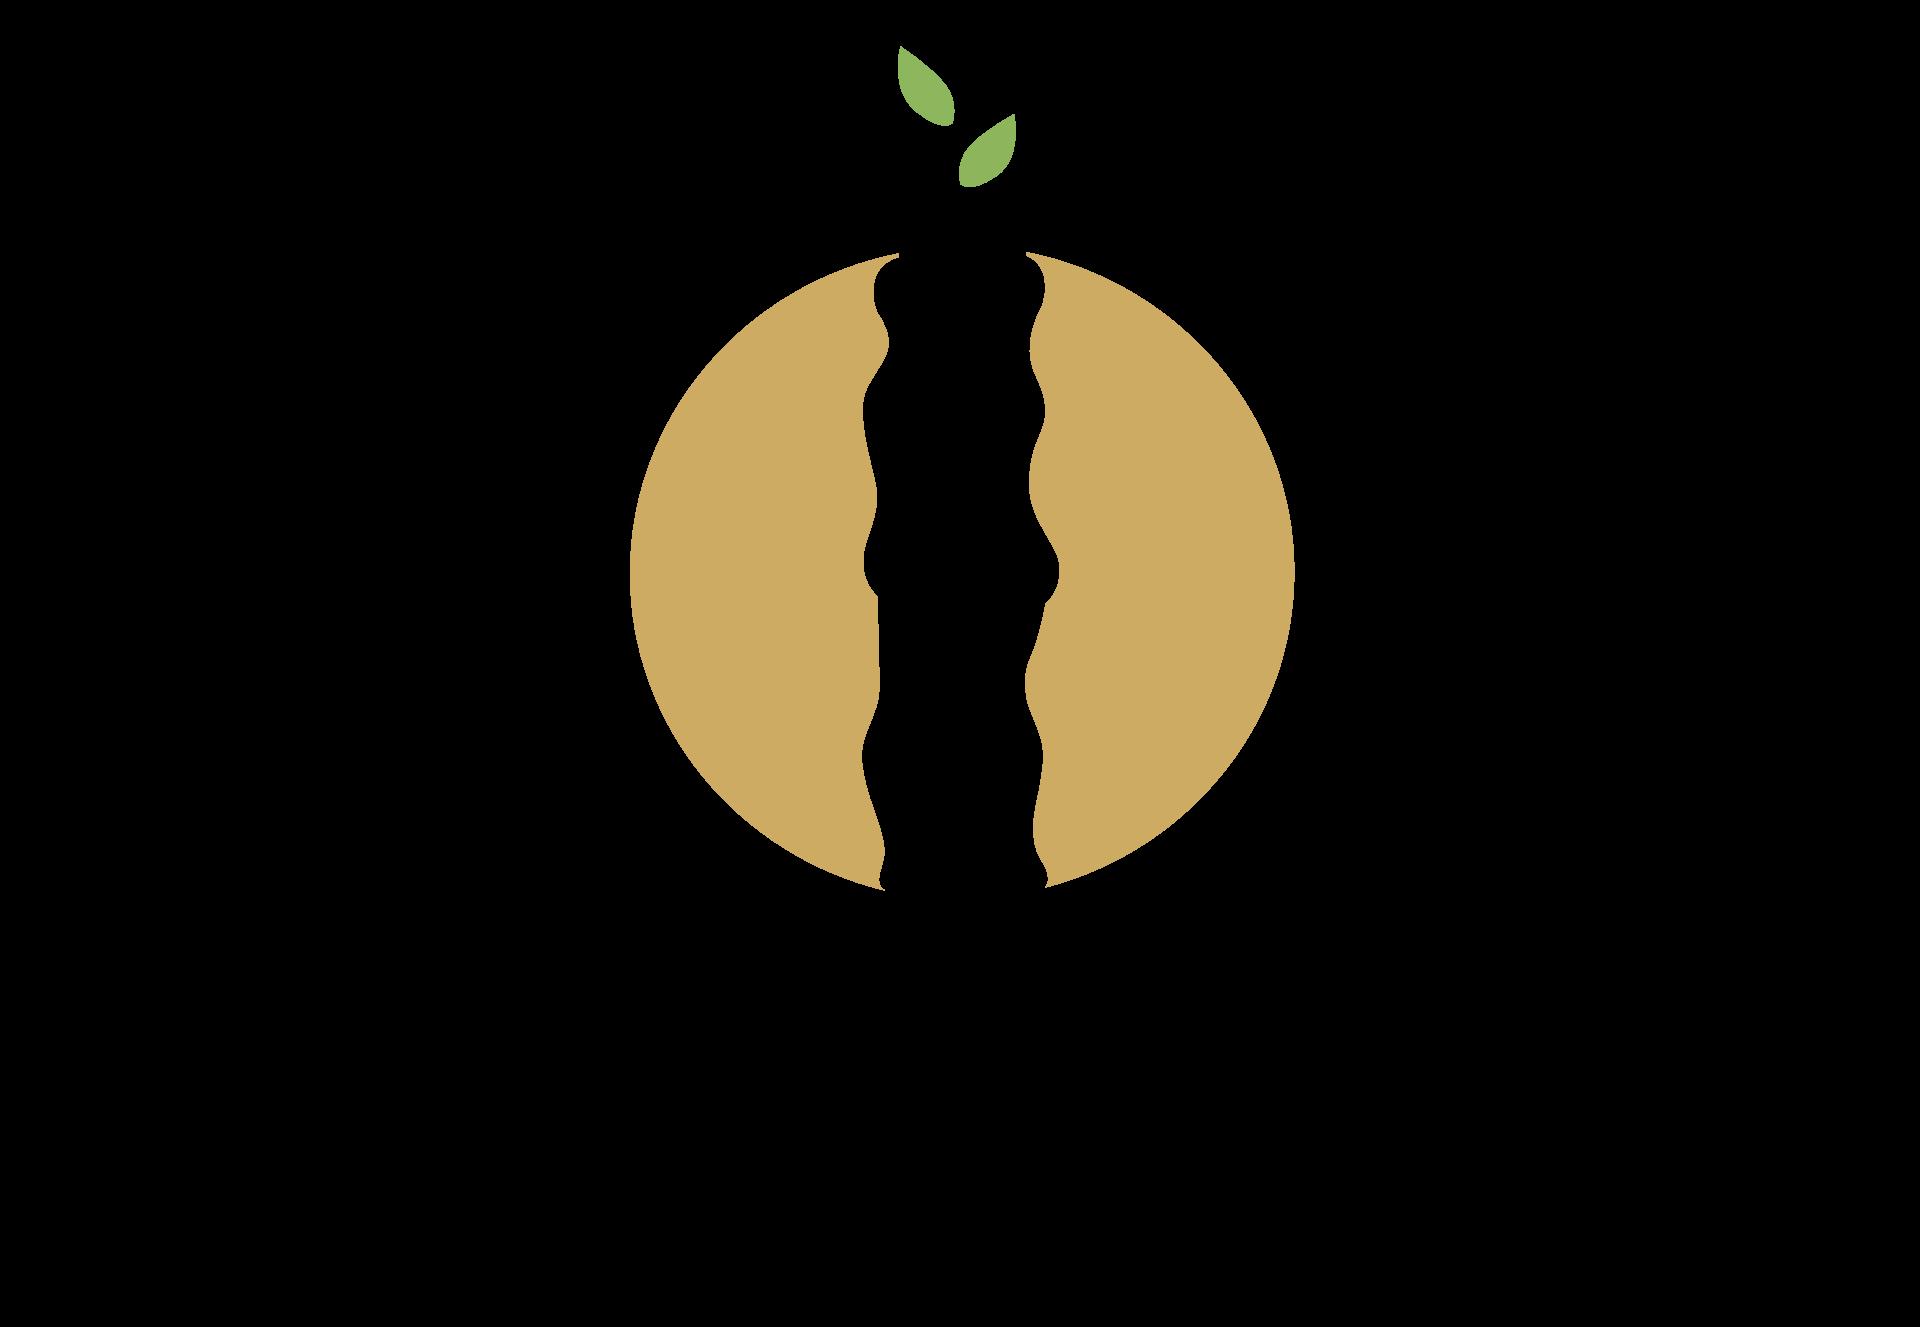 logo_final_HD_transparent